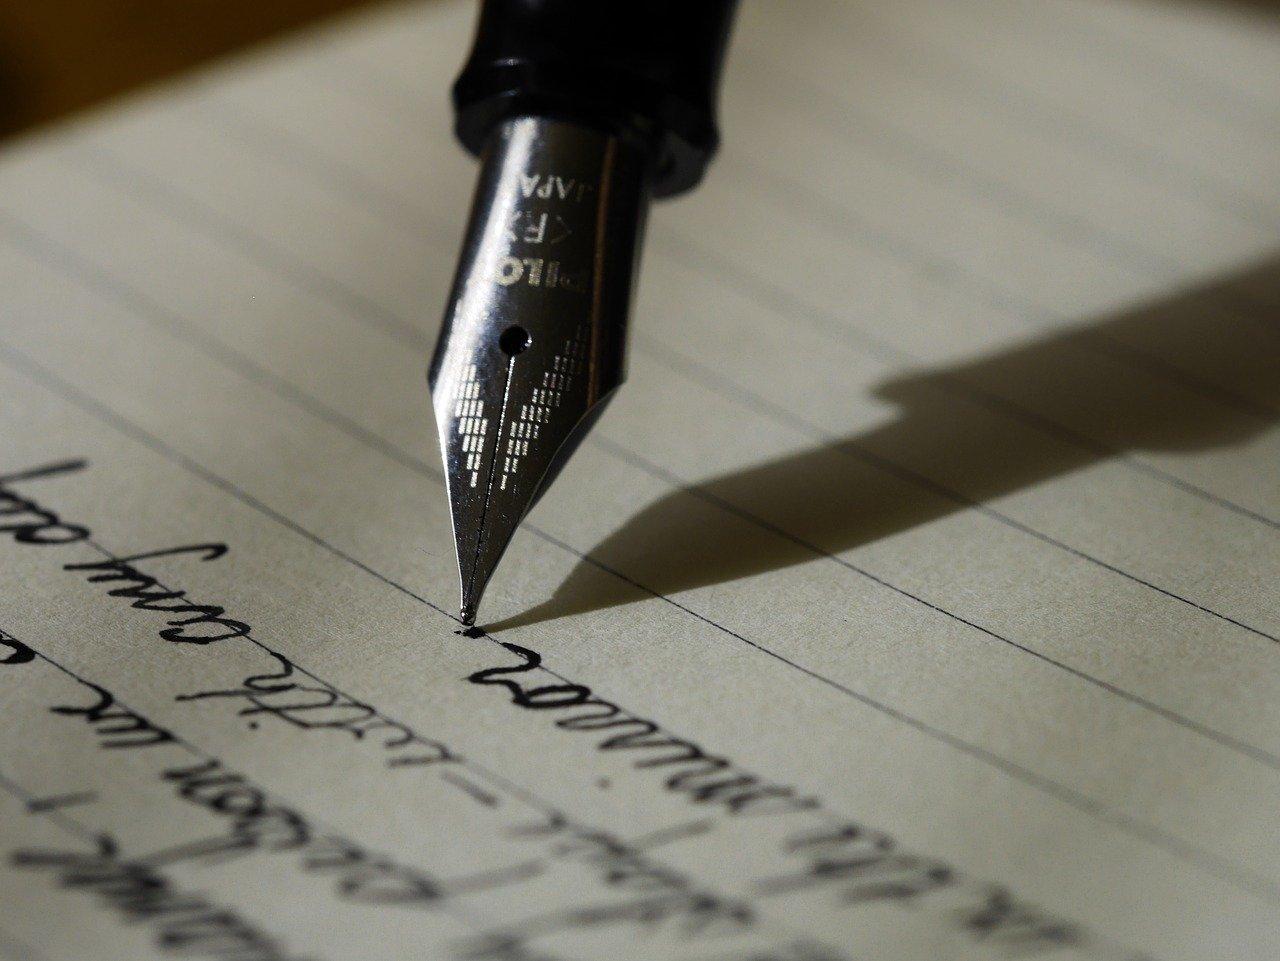 prueba-pericial-pericia-caligrafica